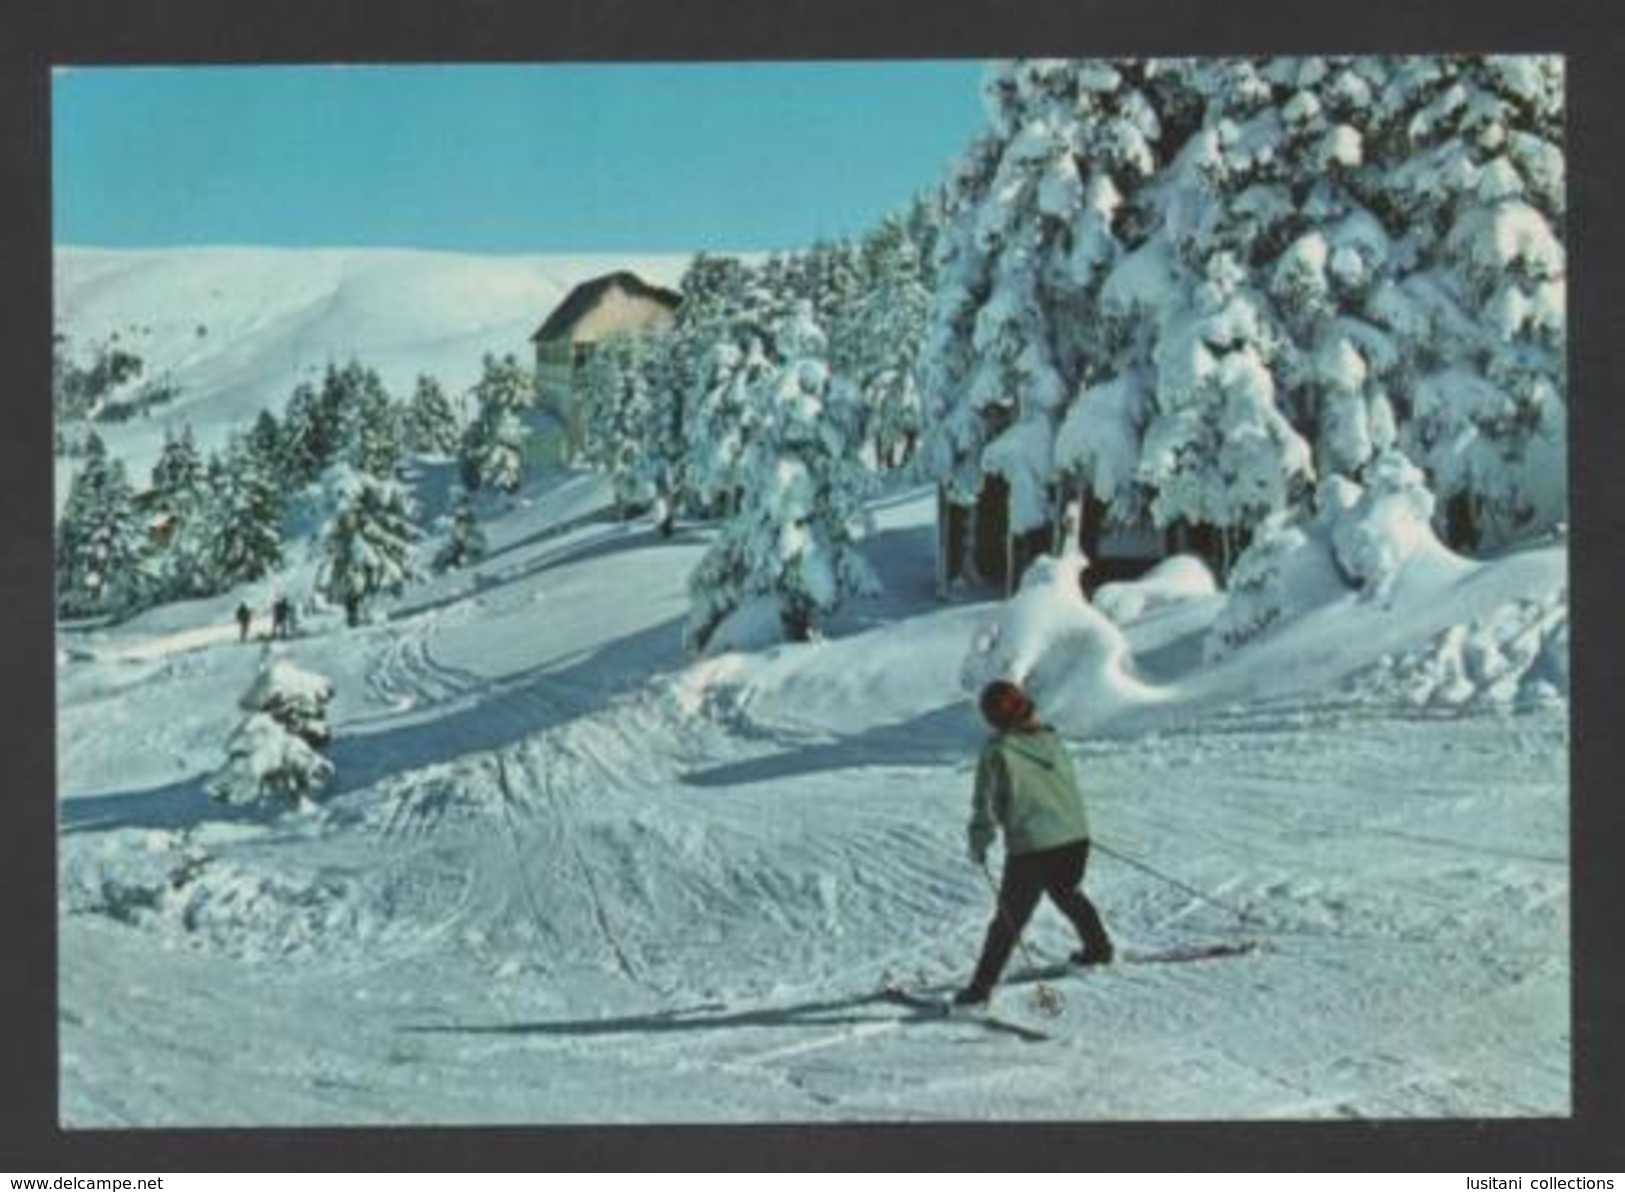 Postcard TURKEY TURQUIE A. YESIL BURSA ULUDAG &  SKIY SKIING WINTER SPORTS 1960s - Postcards